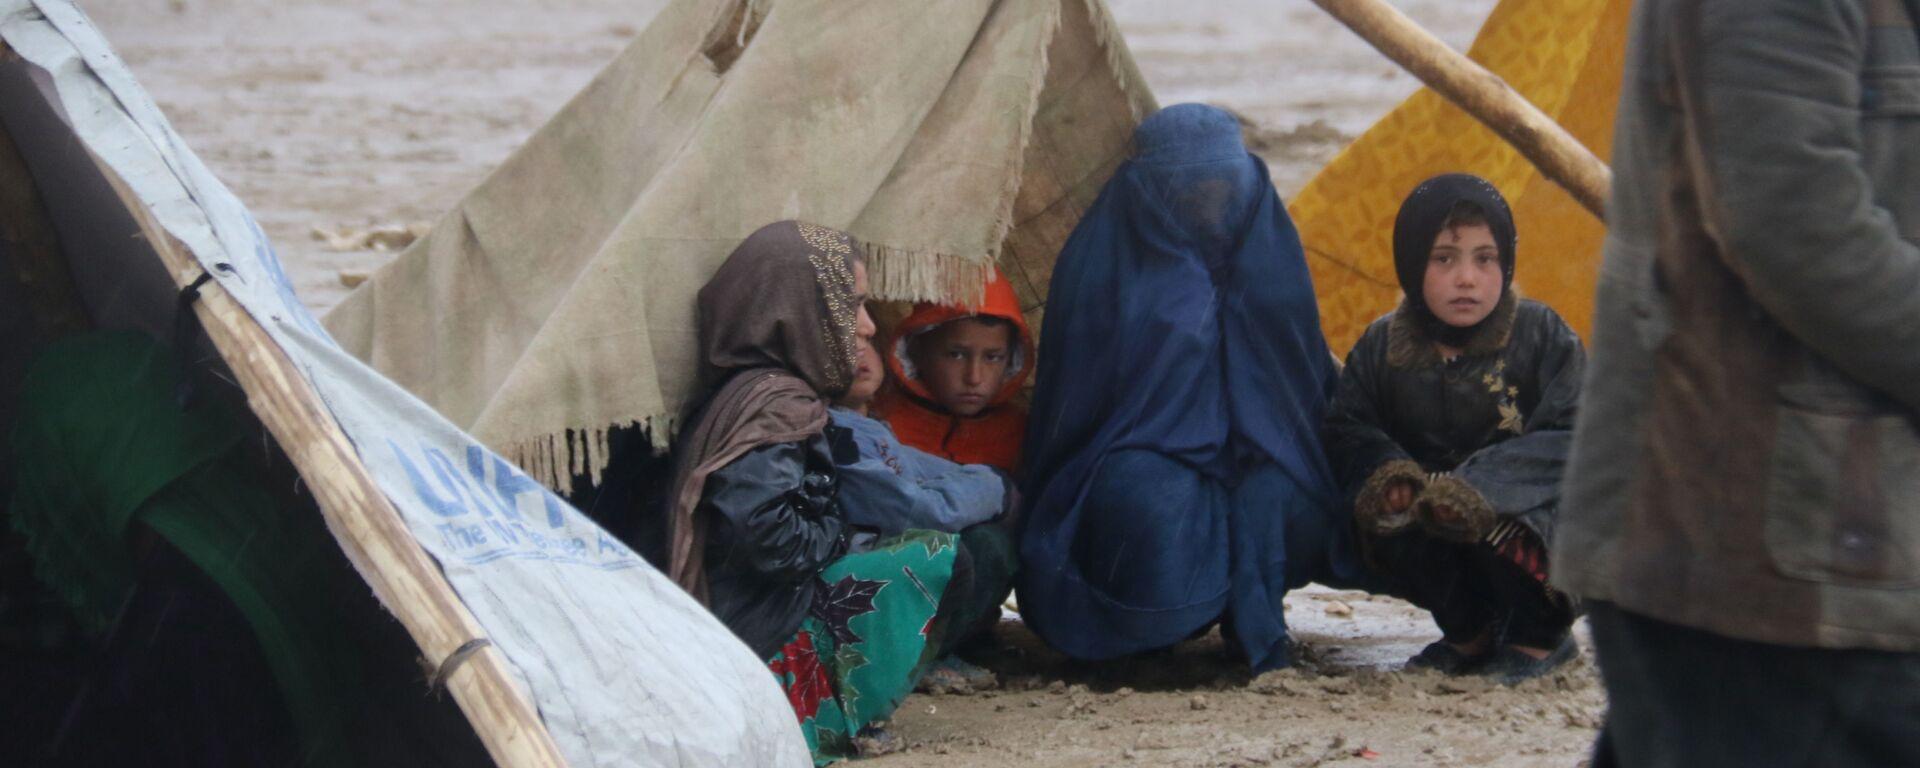 Rifugiati afghani a Mazar-i Sharif - Sputnik Italia, 1920, 14.07.2021